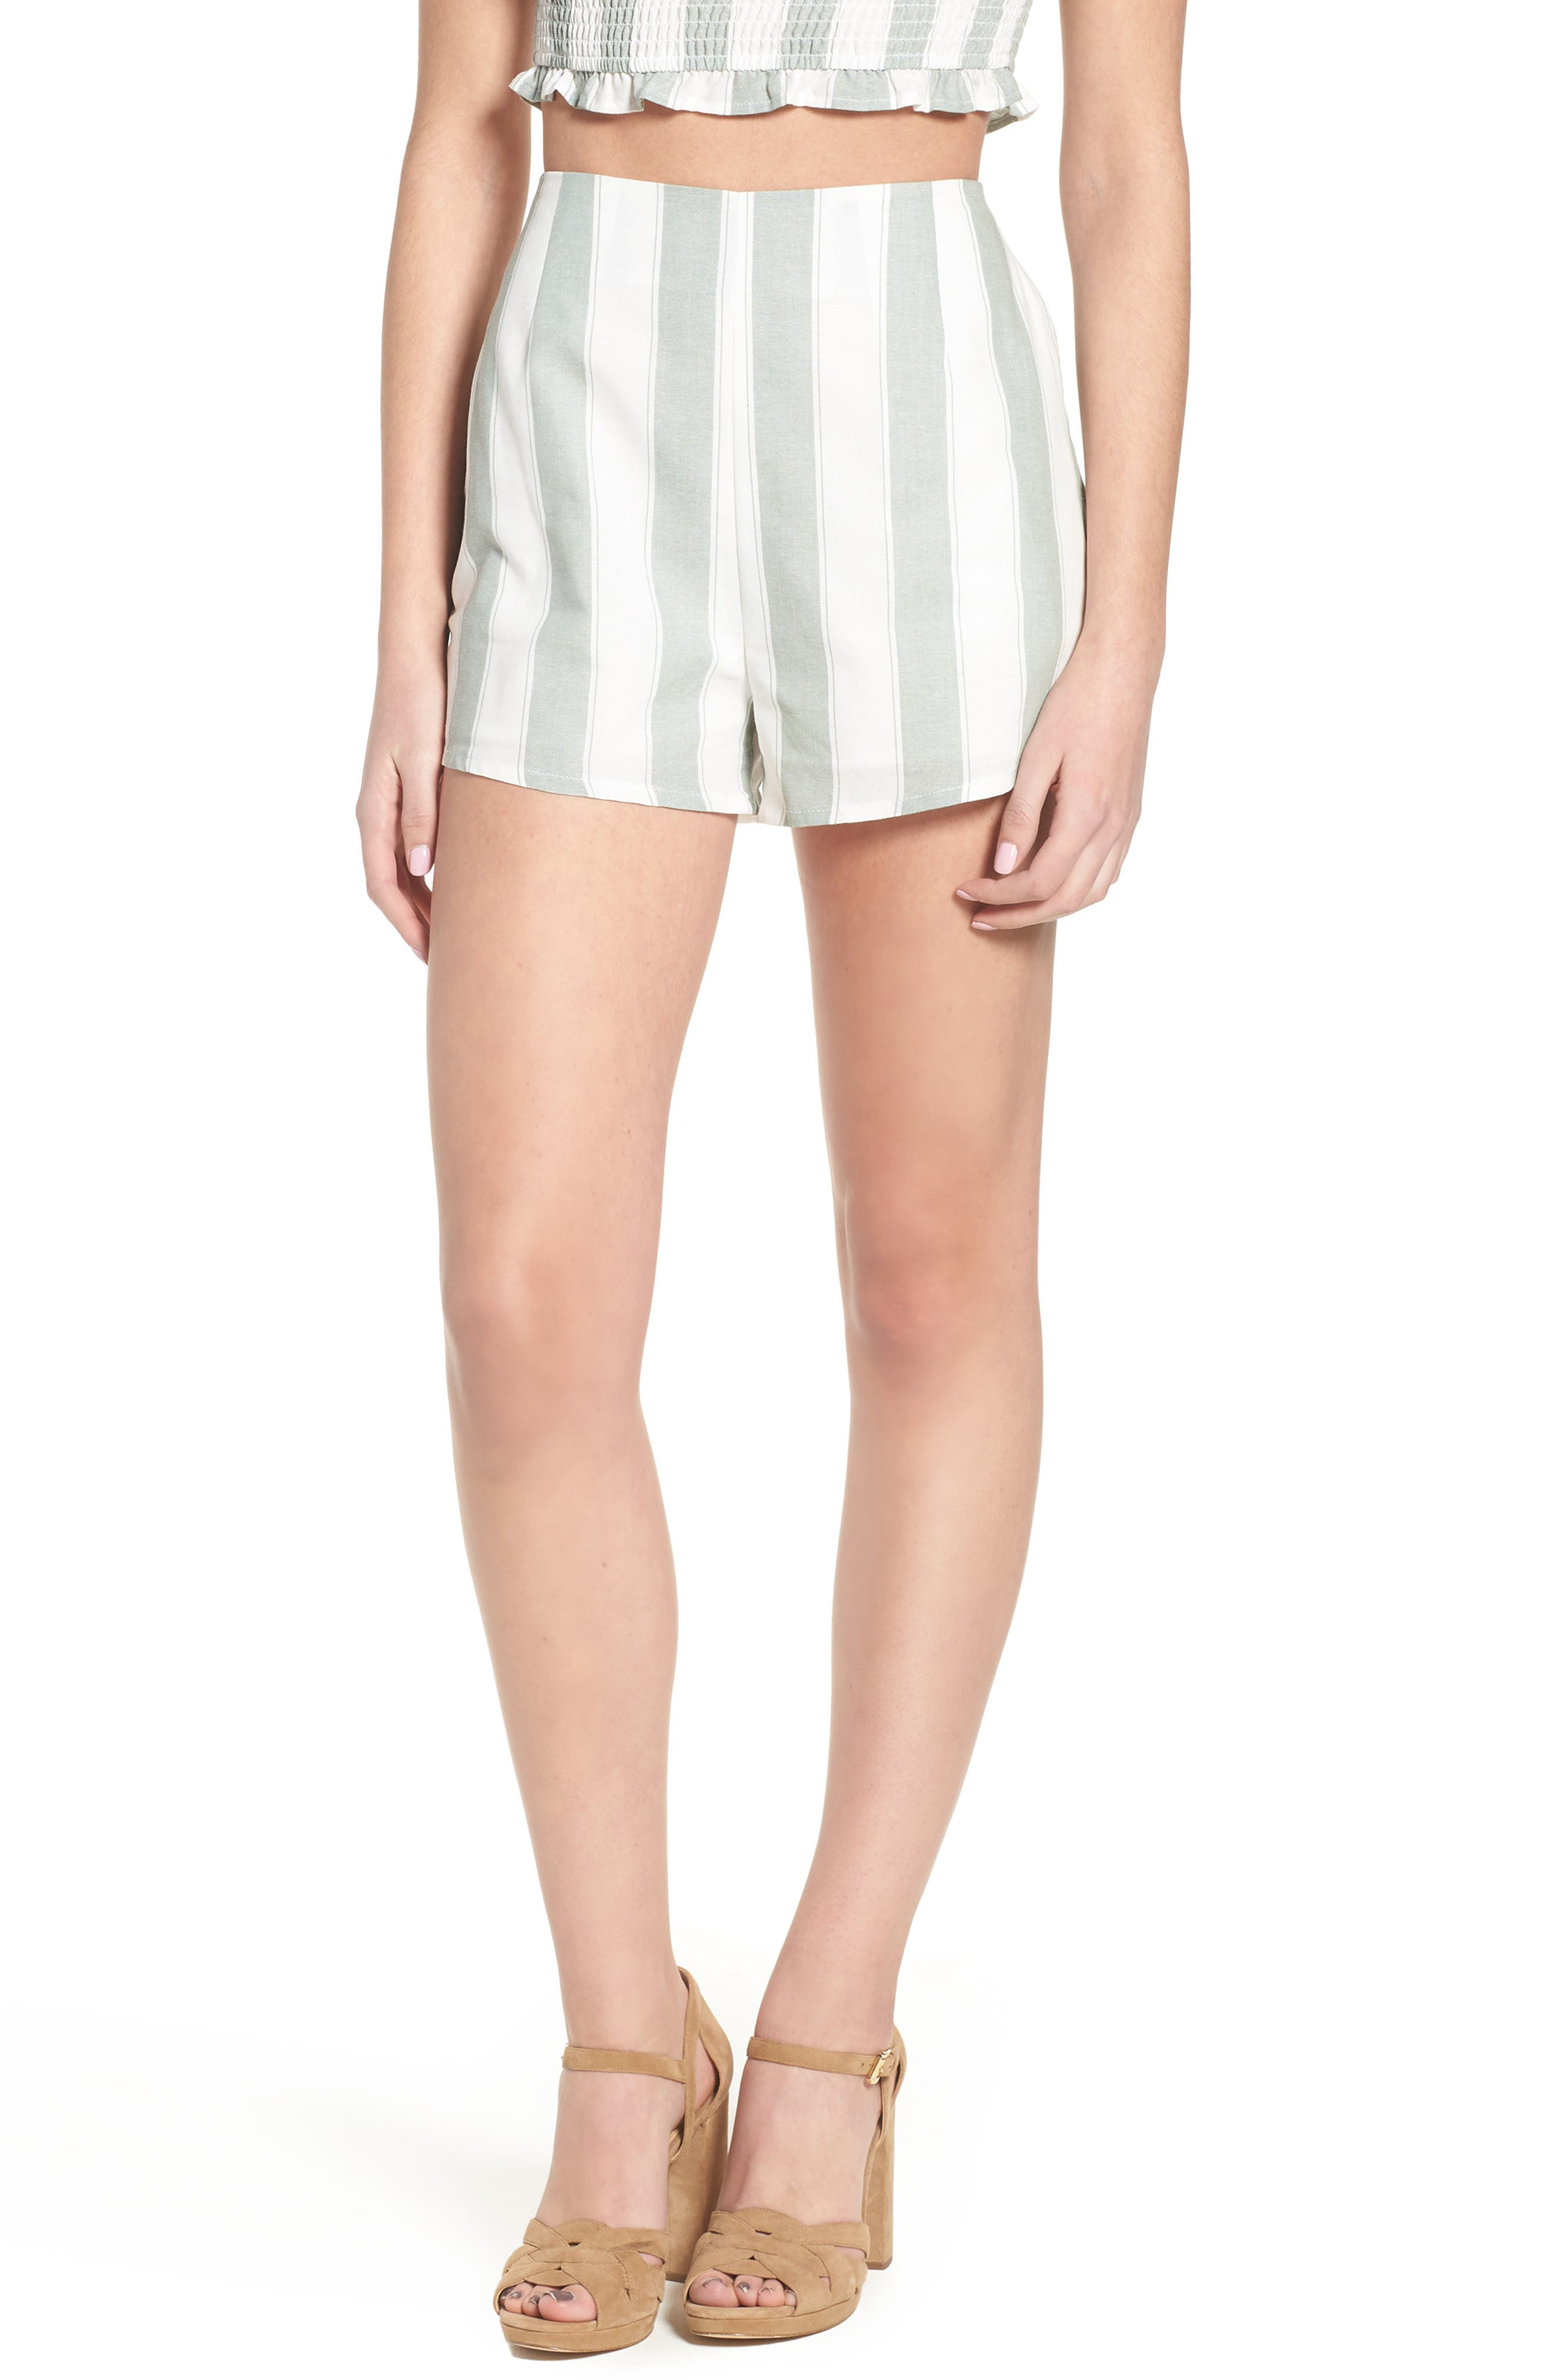 Poetic Stripe Shorts,                         Main,                         color,